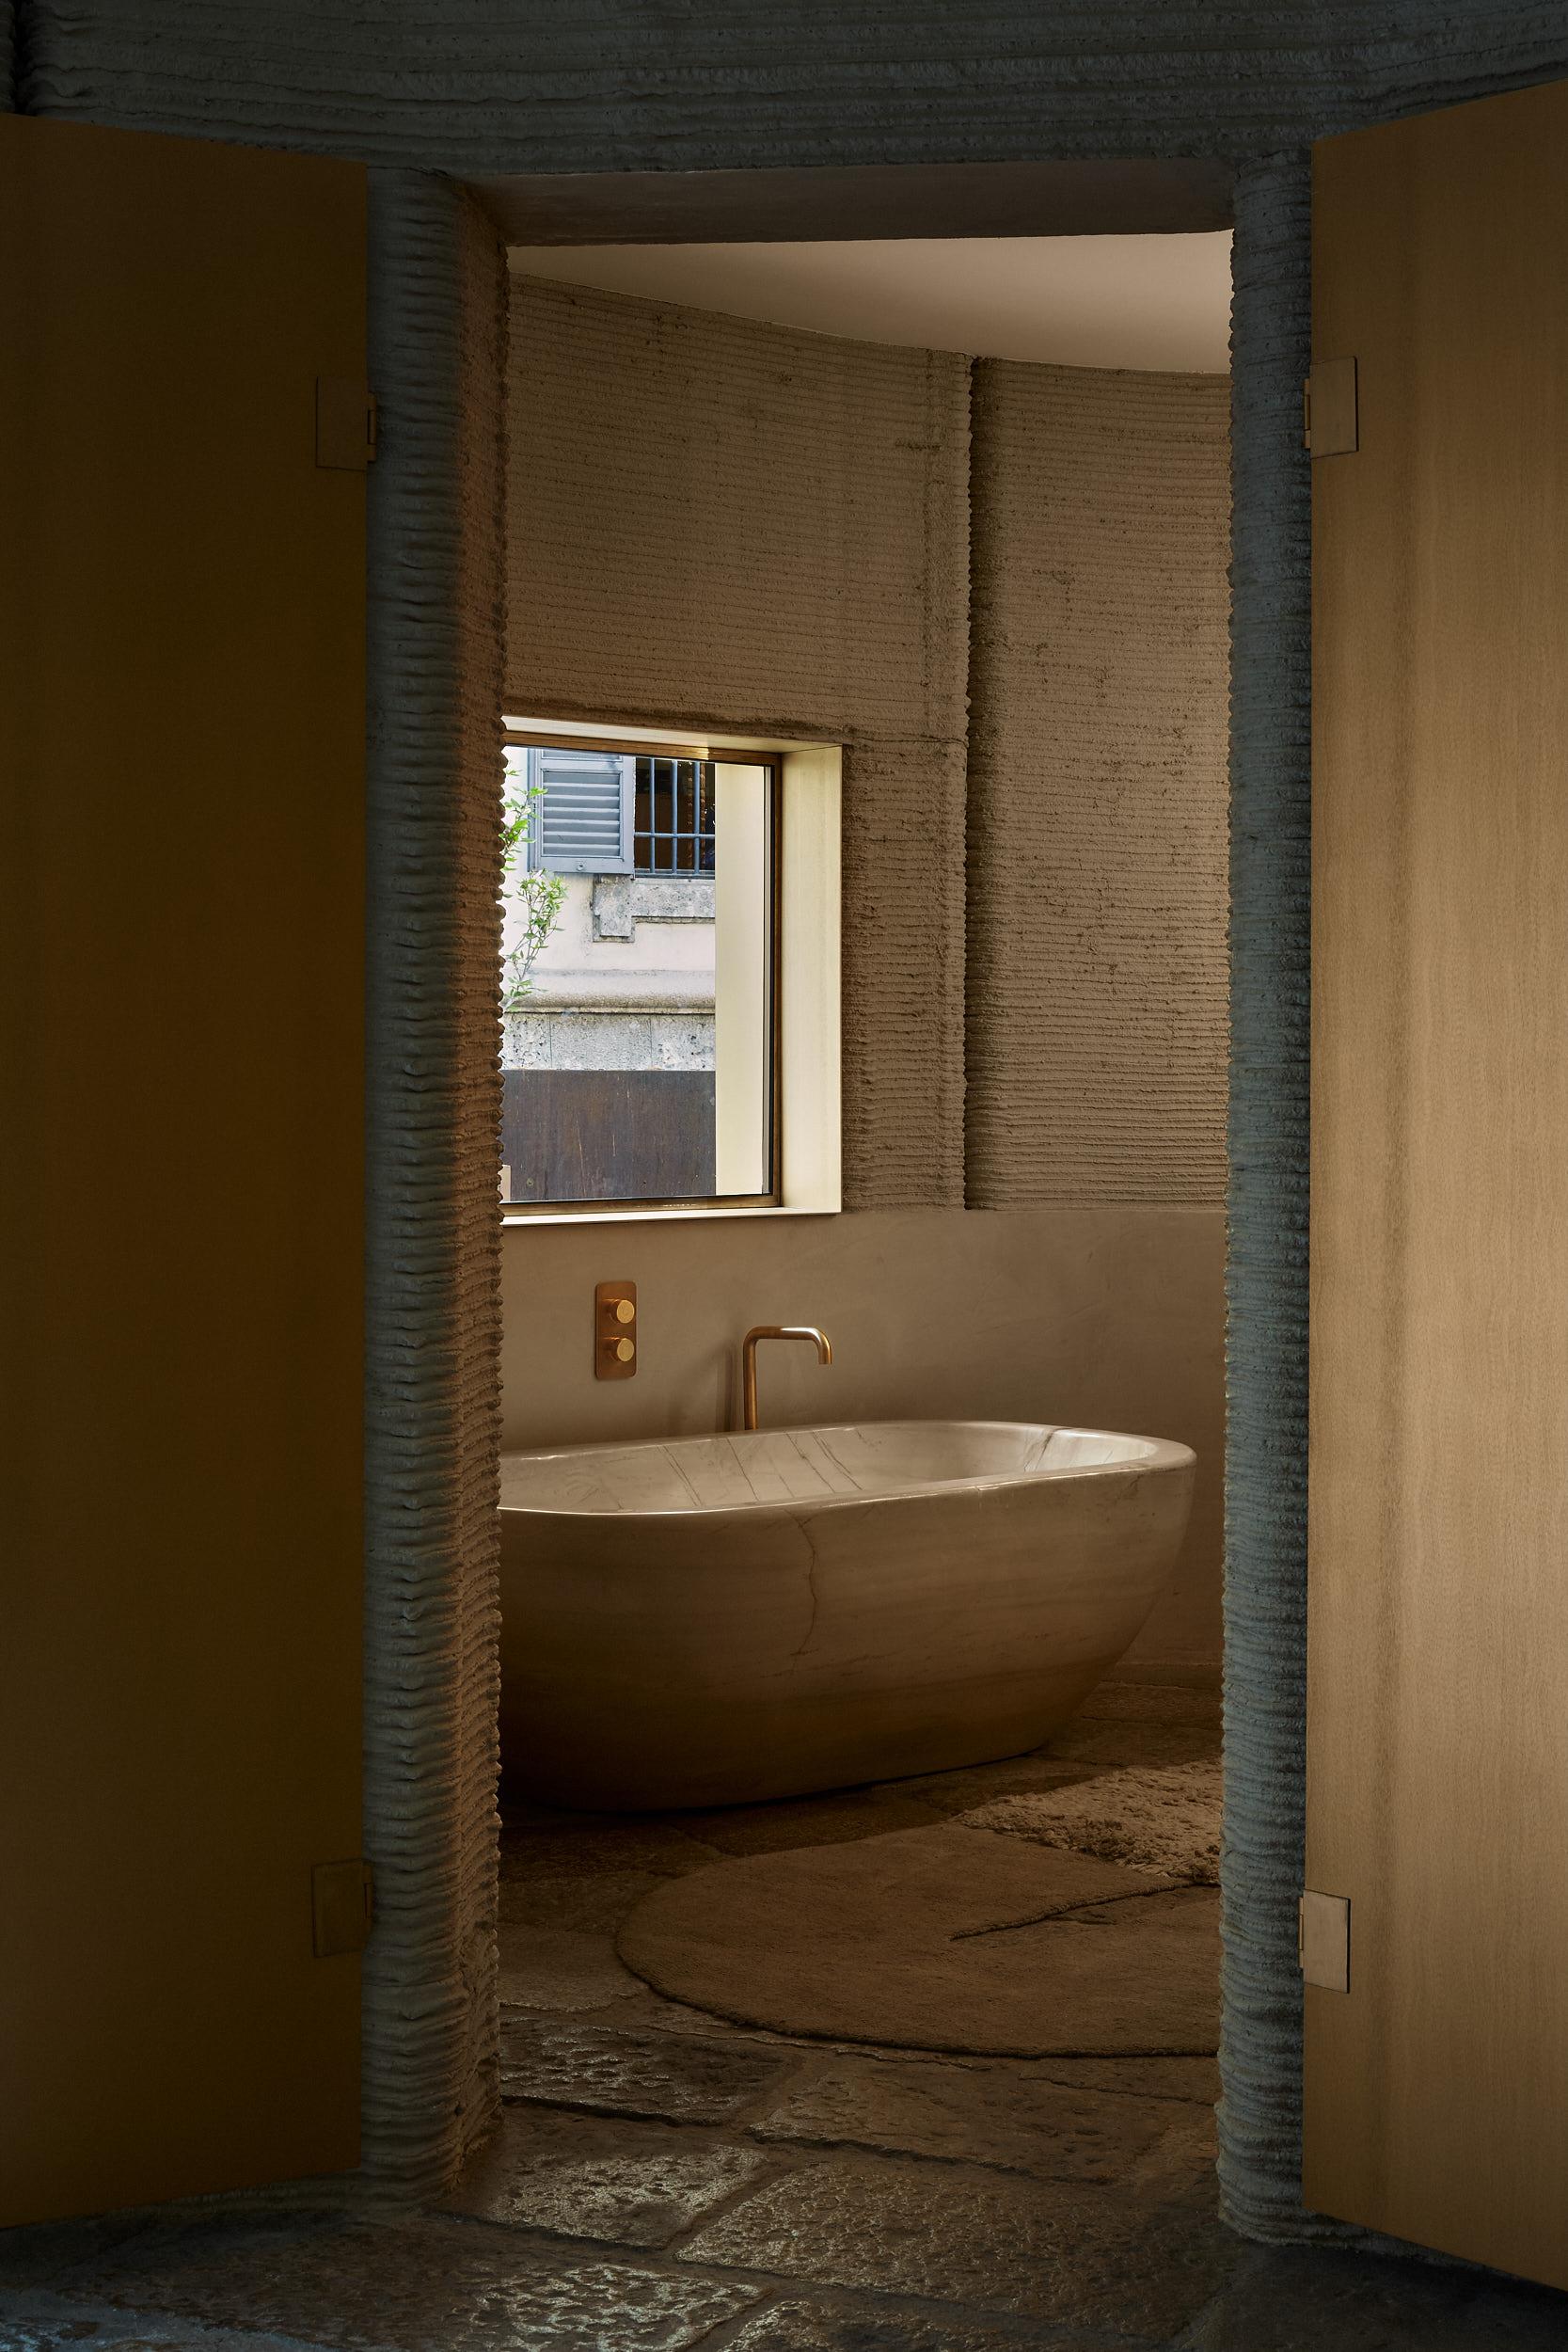 3D Housing 05 by CLS Architetti on Anniversary Magazine. Photo by Alex Lesage — threefold 1.jpg